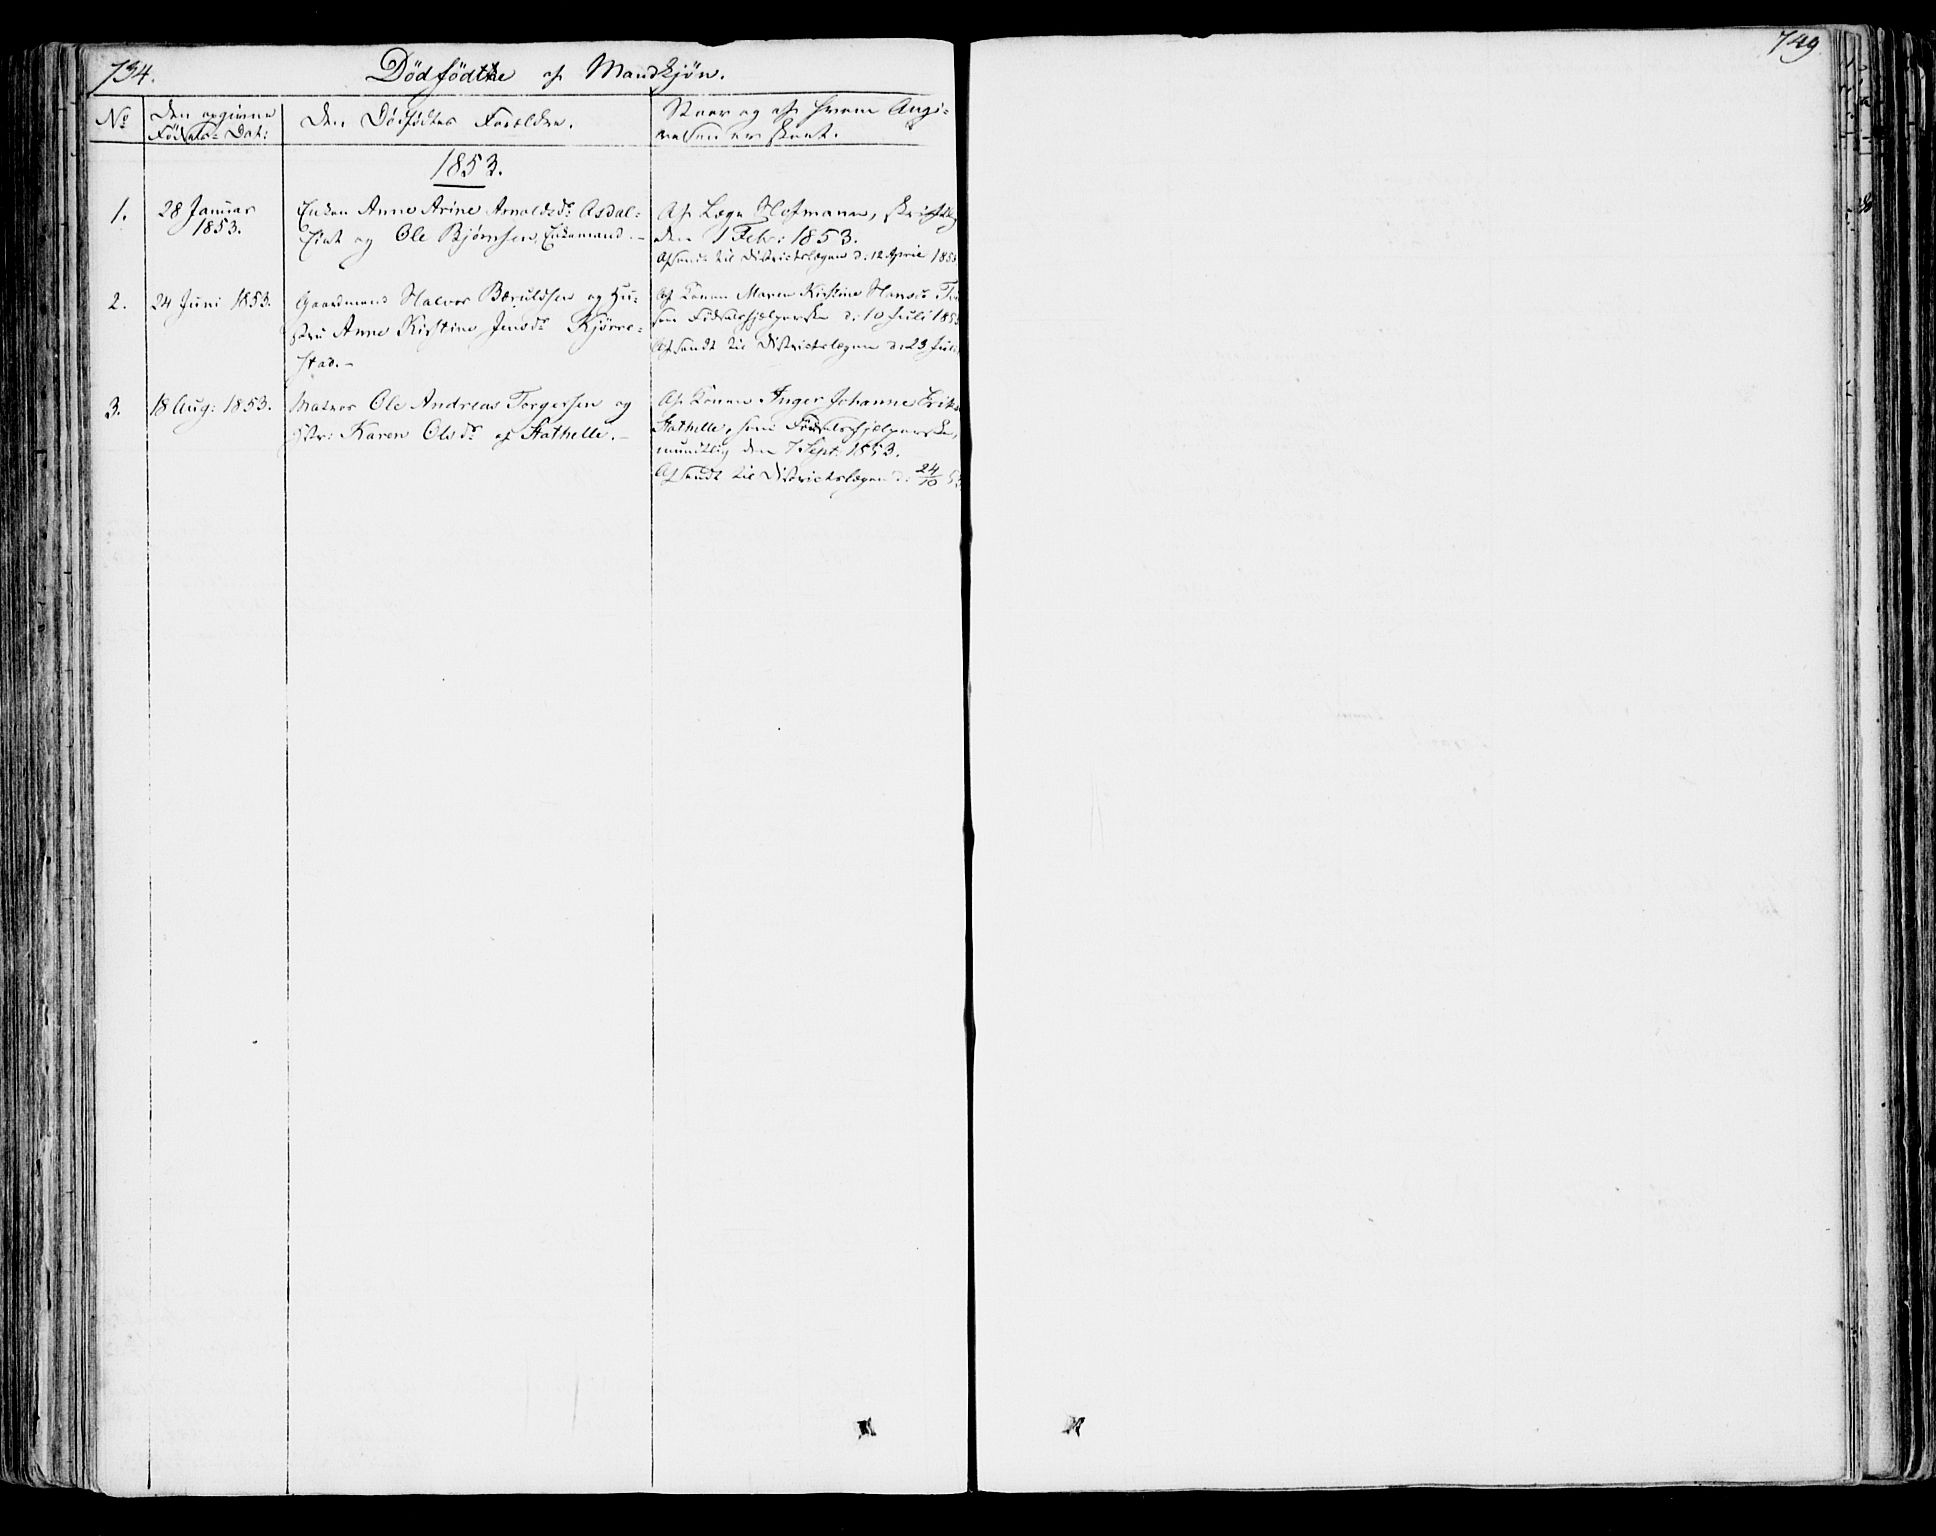 SAKO, Bamble kirkebøker, F/Fa/L0004: Ministerialbok nr. I 4, 1834-1853, s. 734-735